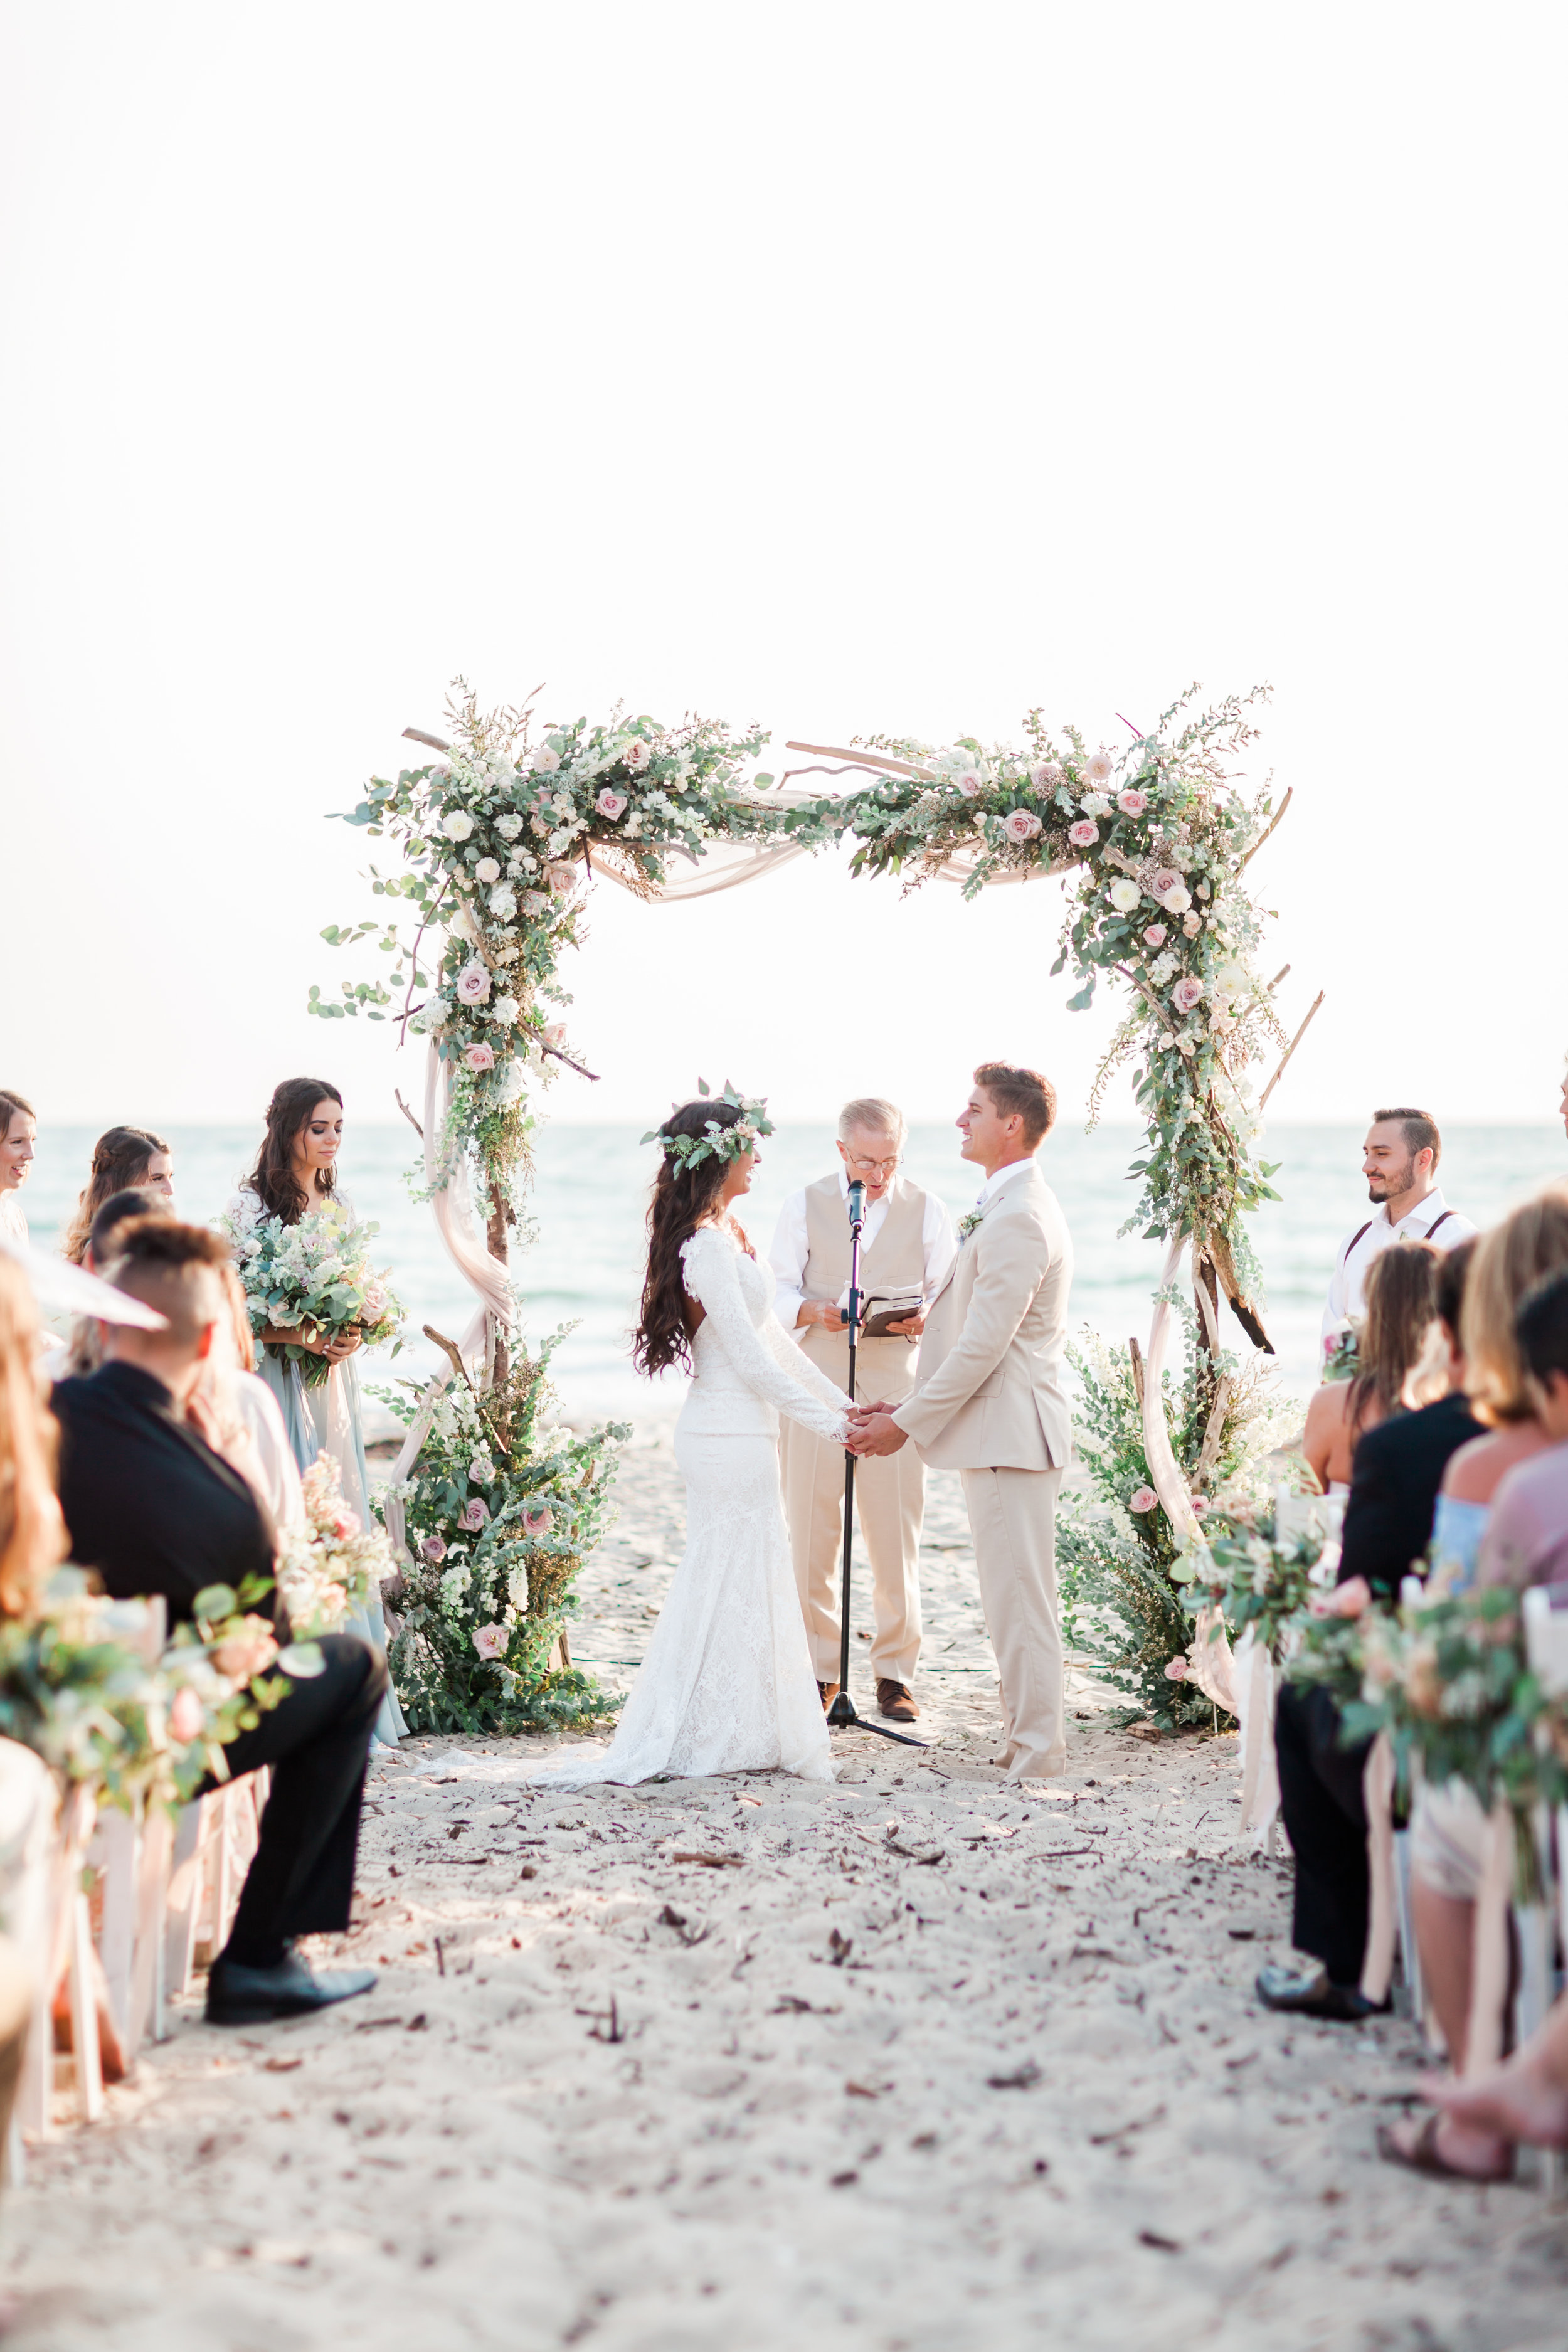 Destination Beach Wedding_Valorie Darling Photography-3157.jpg